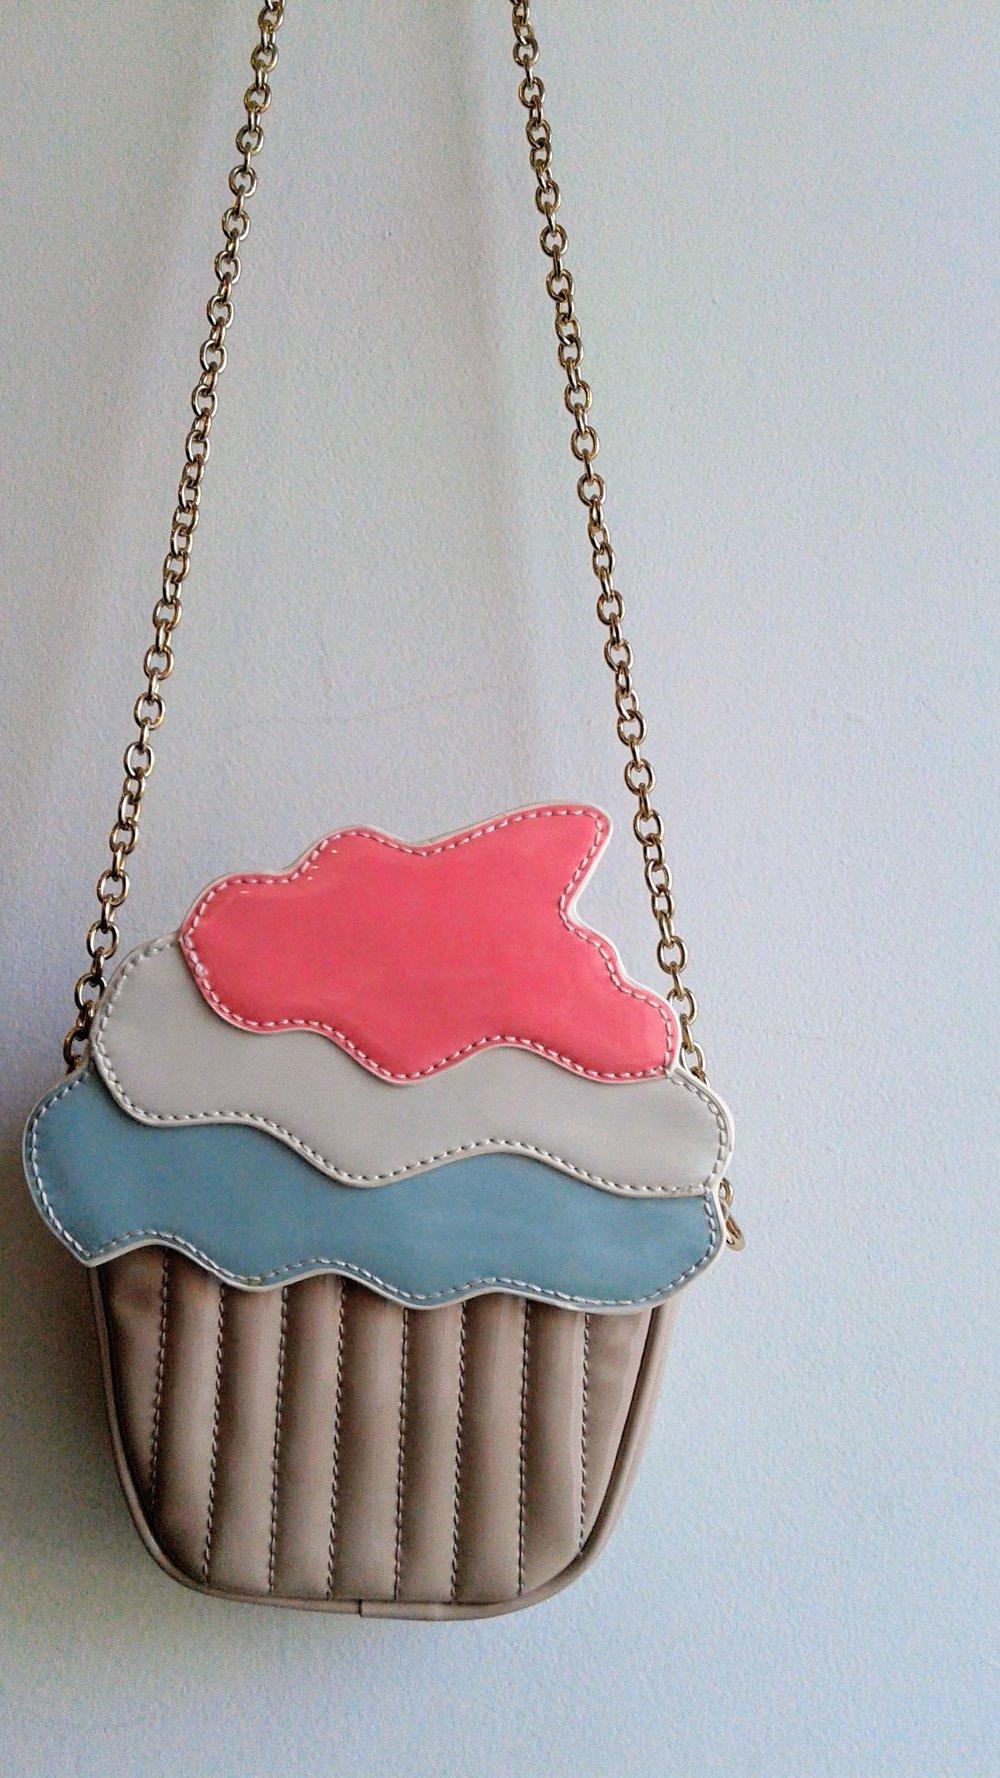 Cupcake purse, $18